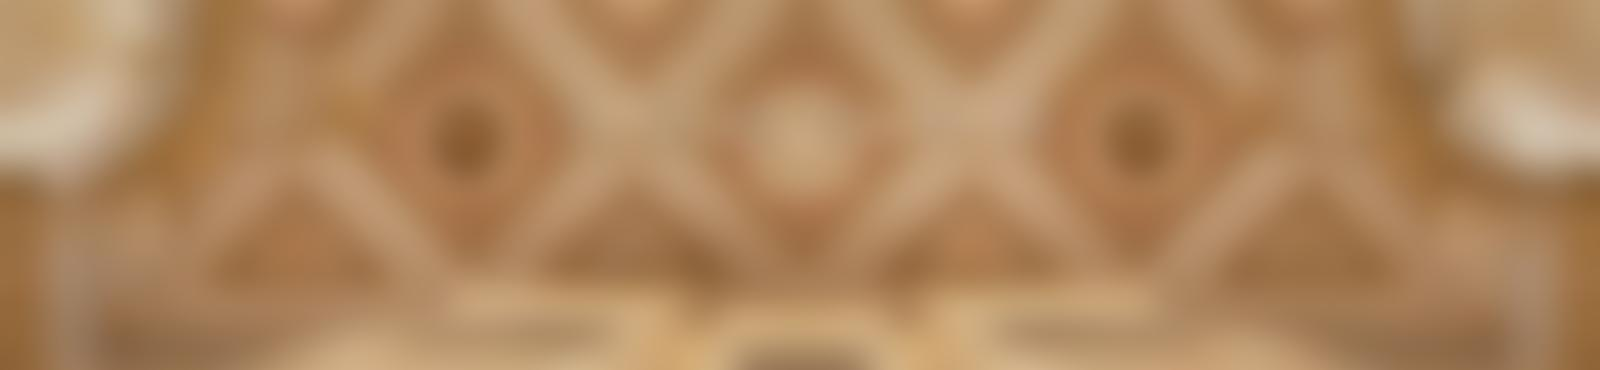 Blurred 5e8be2d4 9edb 494d ad3d 8a094b9b7c6e